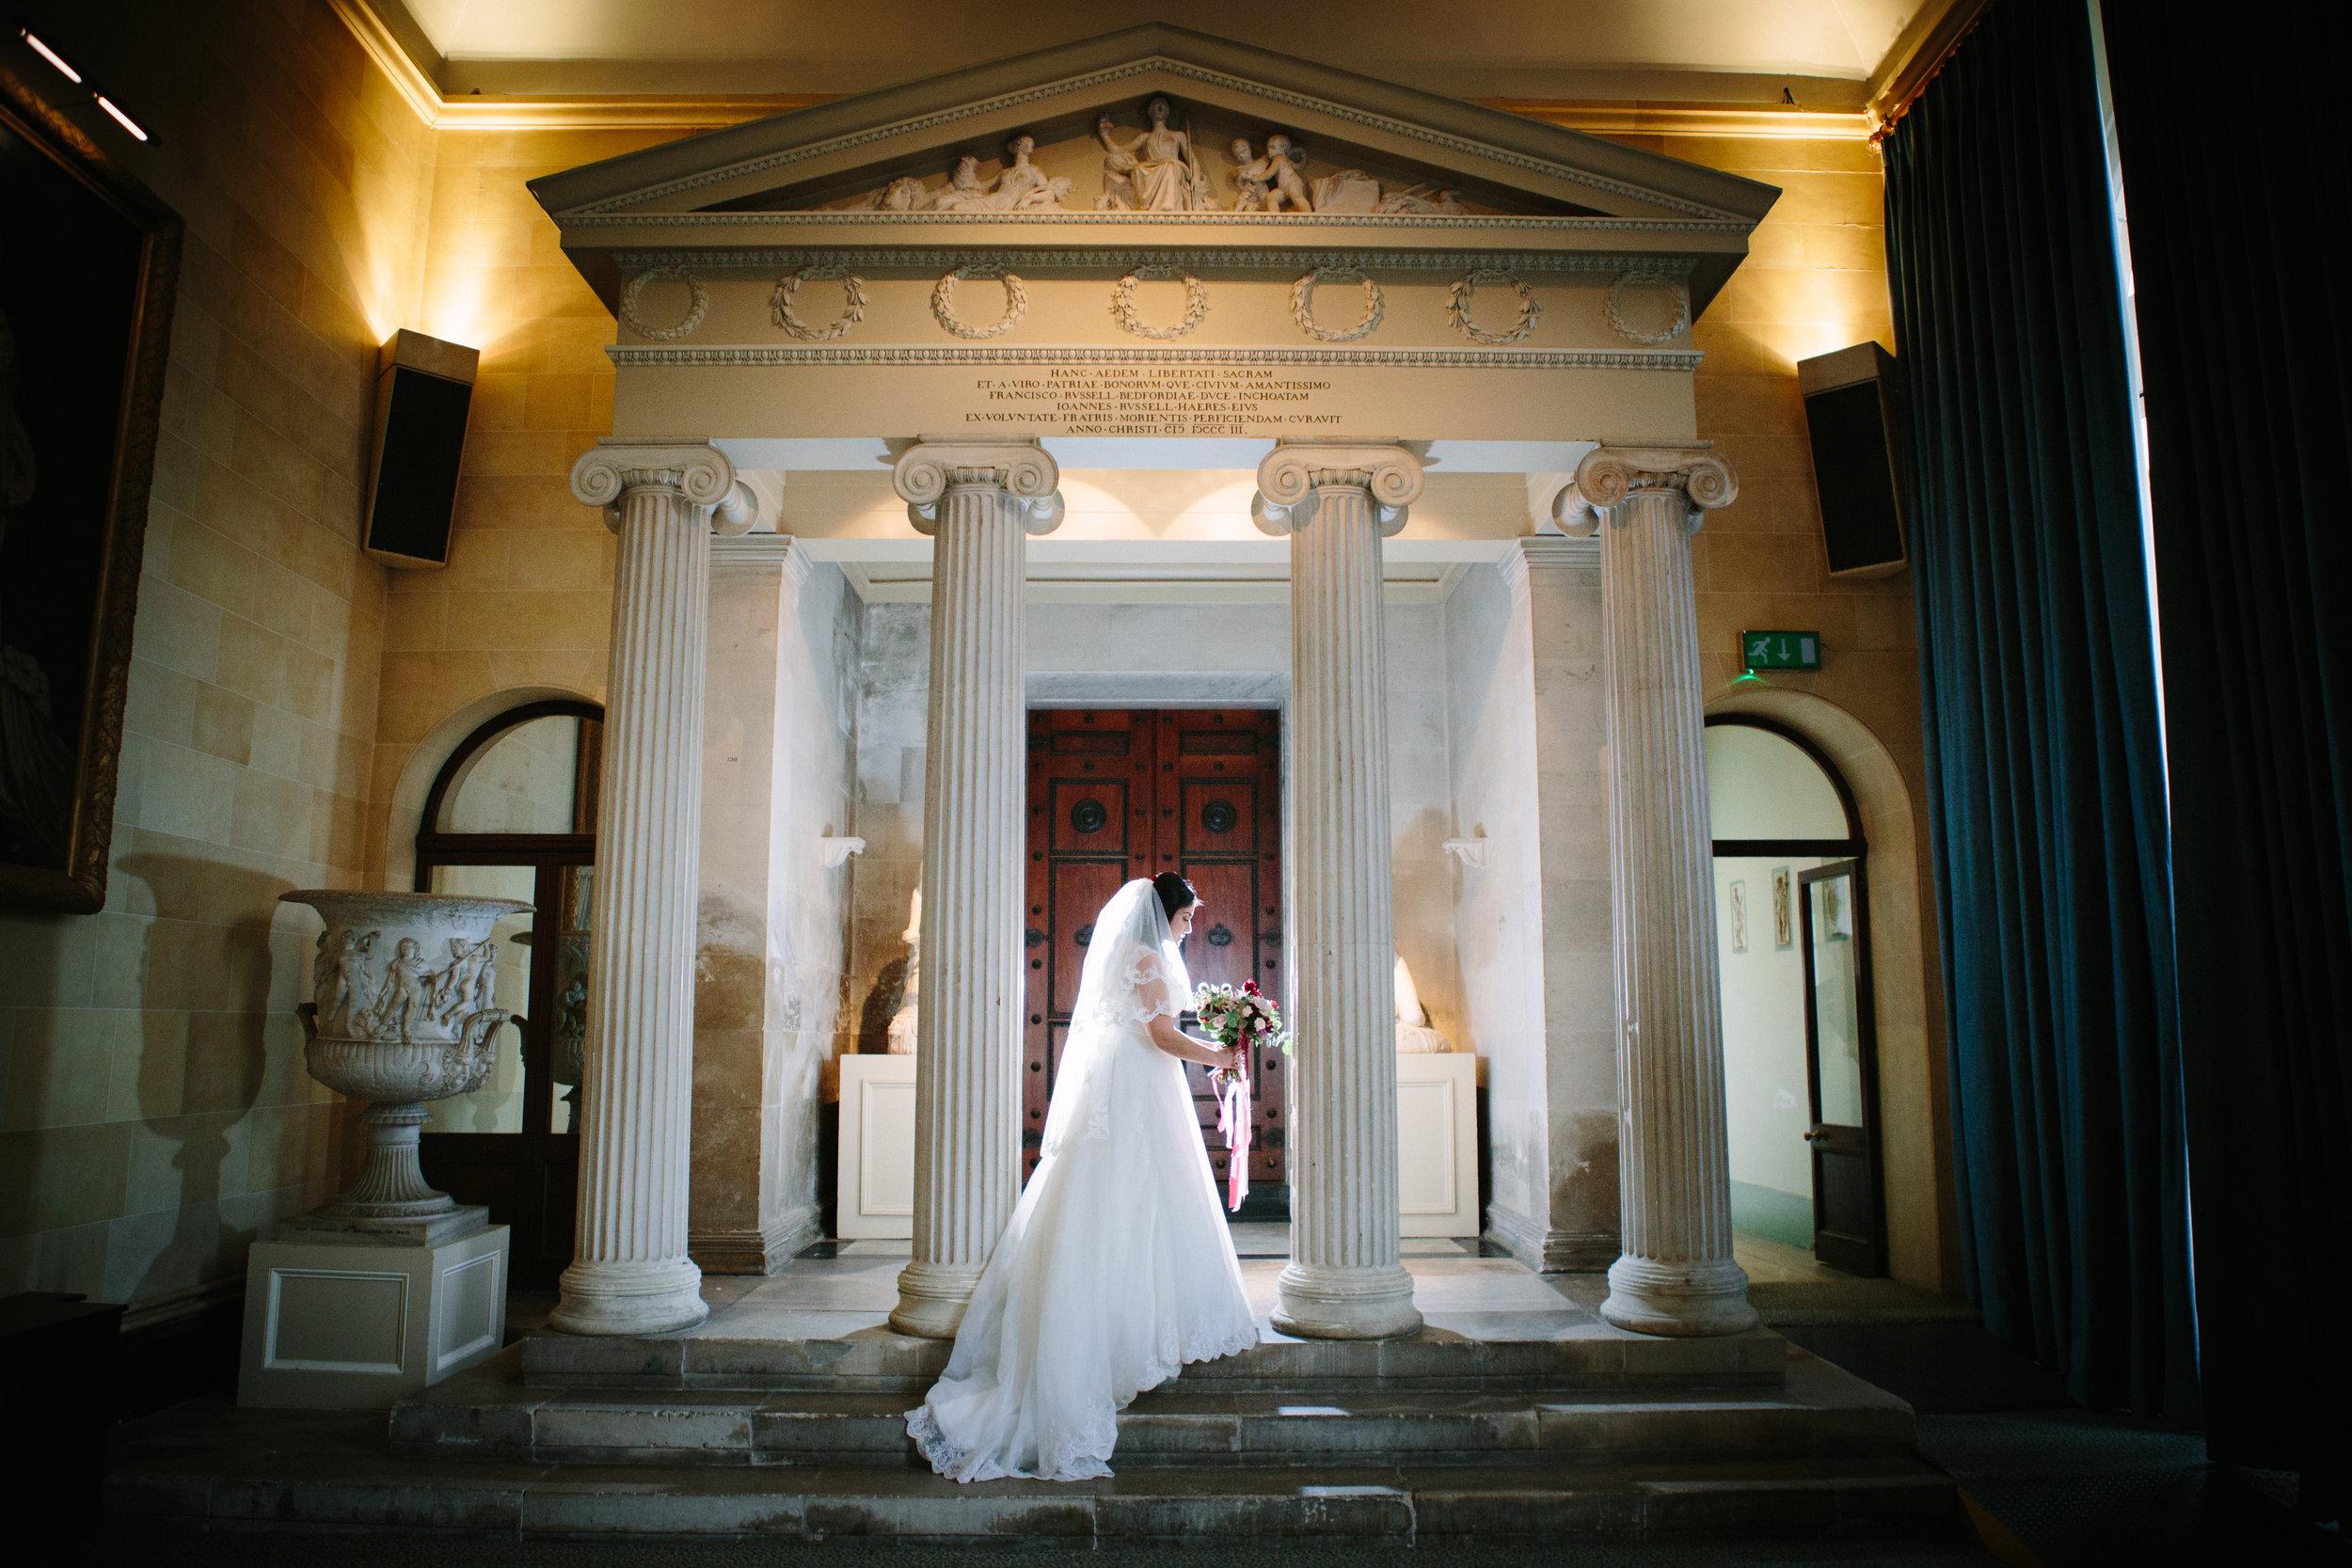 london-bedfordshire-uk-wedding-photography-woburn-sculpture-gallery-bridal-portrait-67